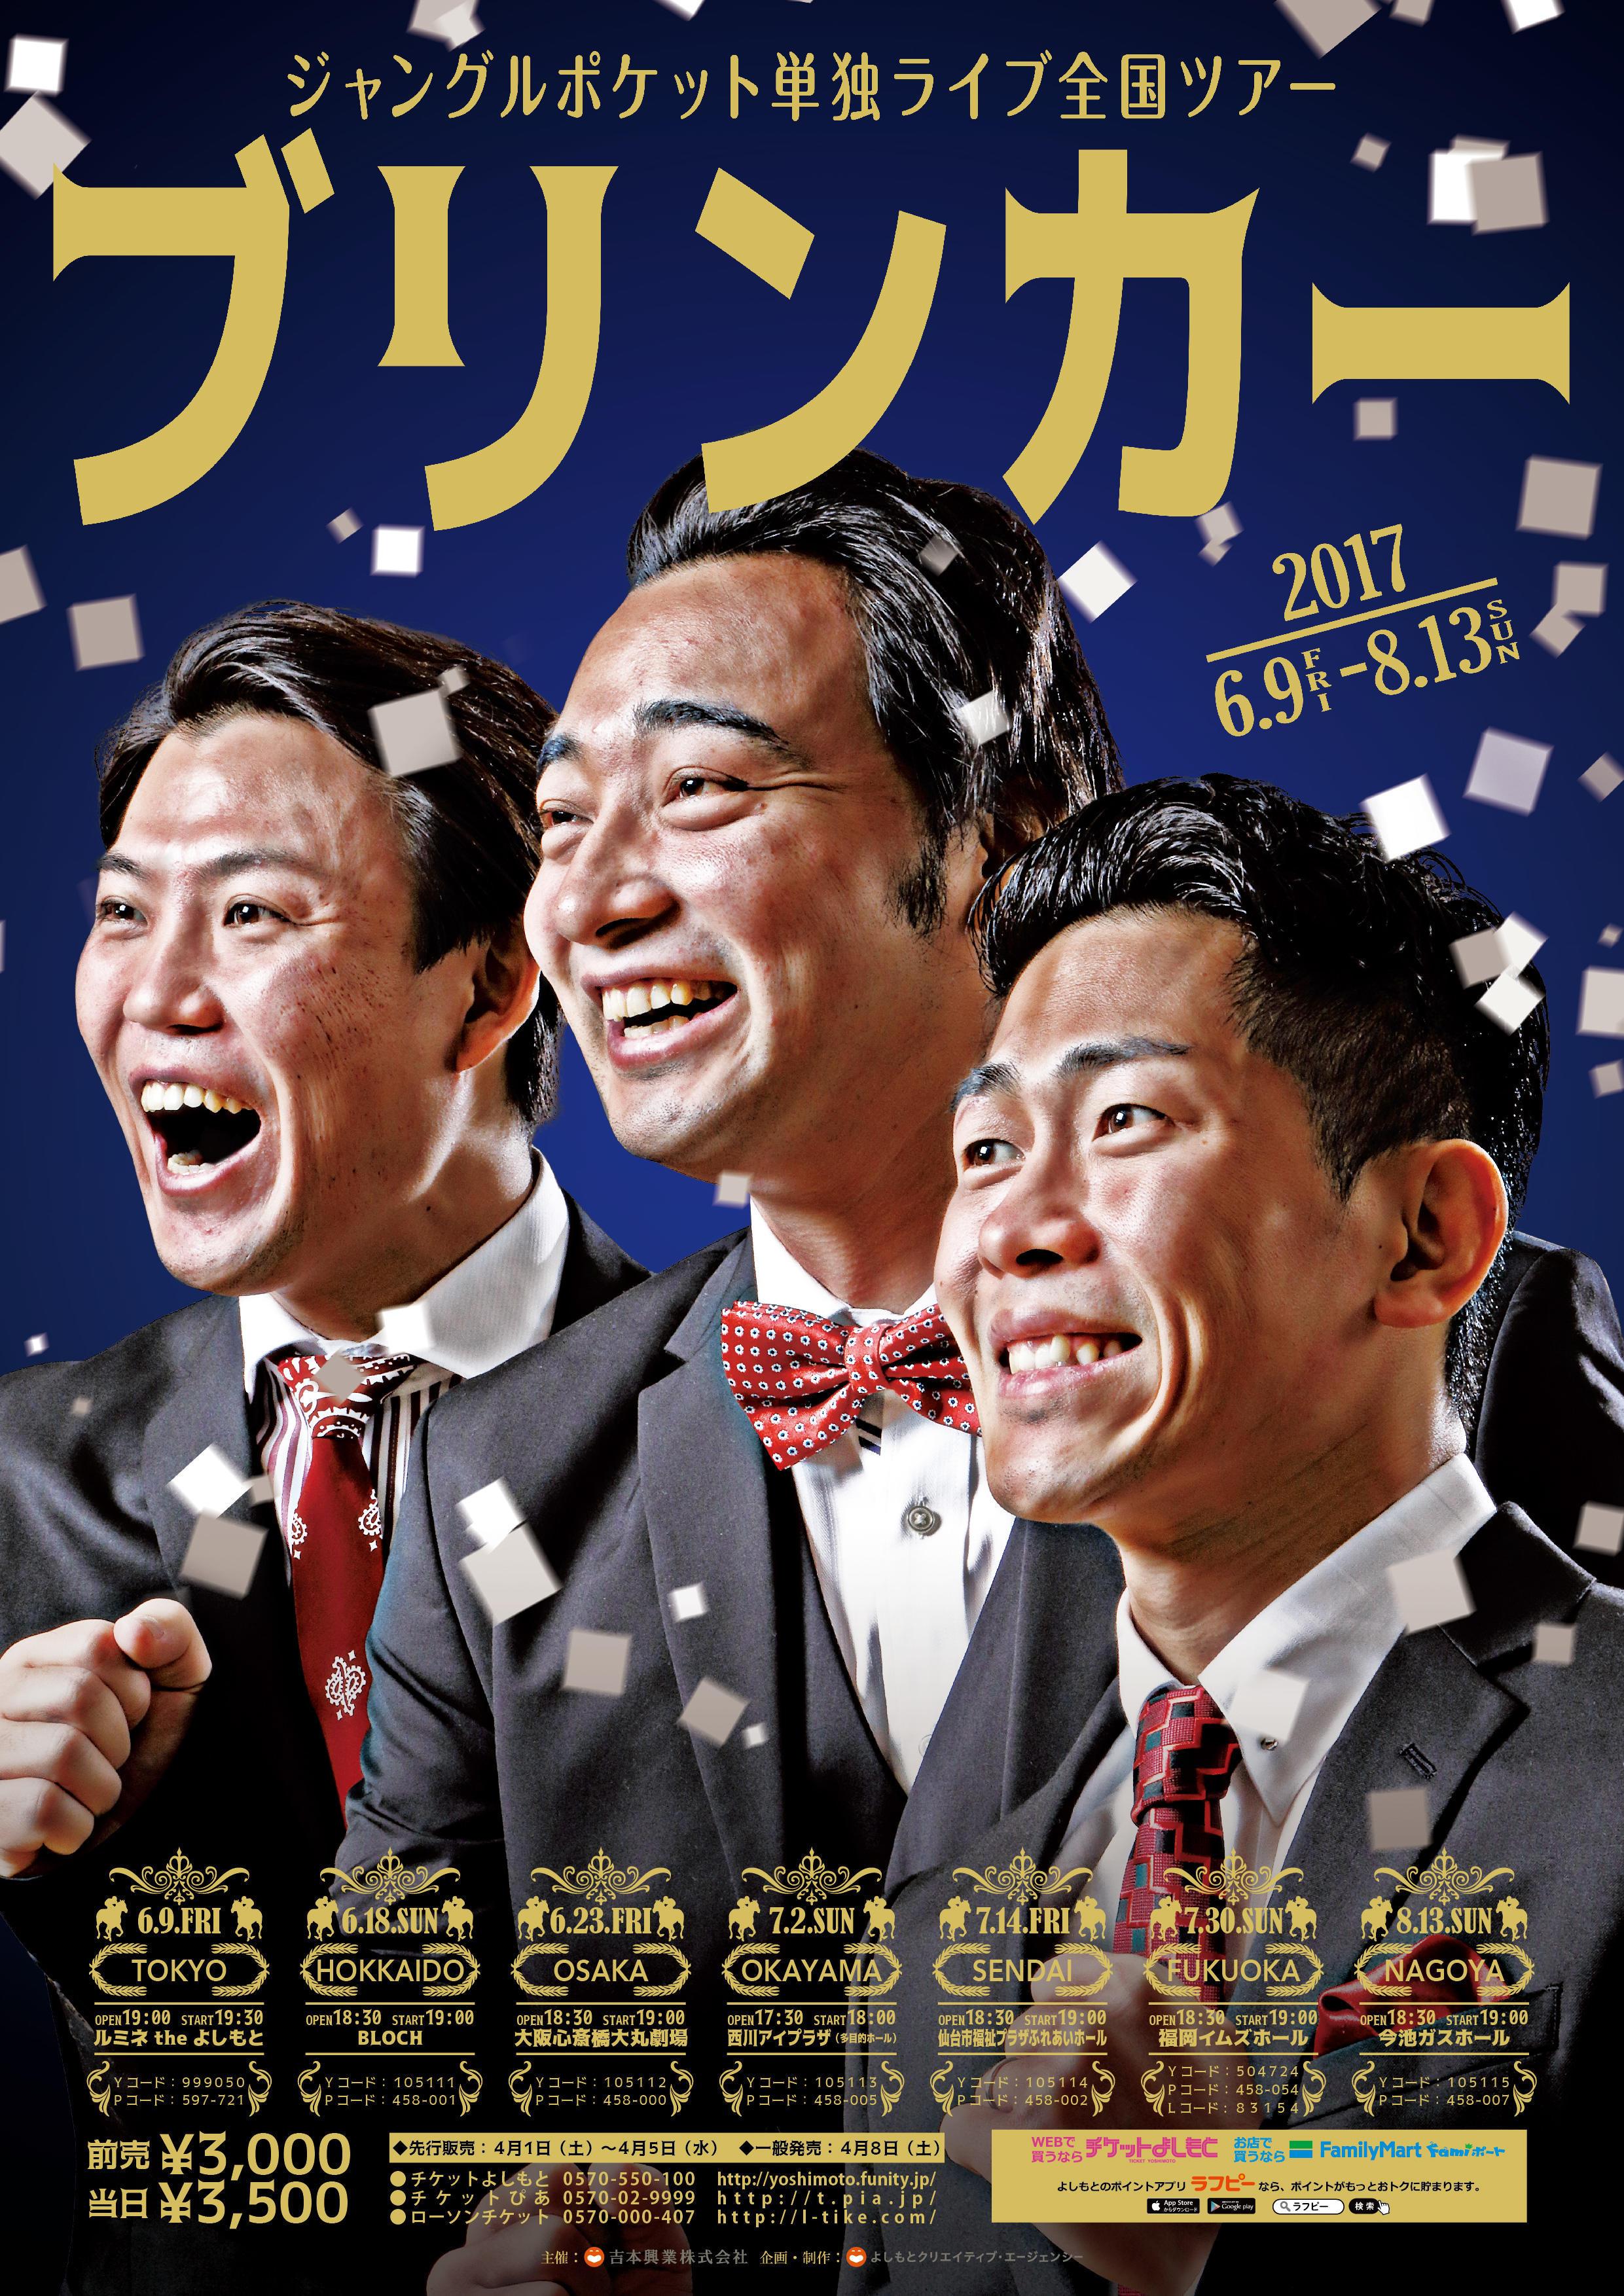 http://news.yoshimoto.co.jp/20170317190746-fe0ccab5447487e554d69d6d7a18e948af25bbf7.jpg